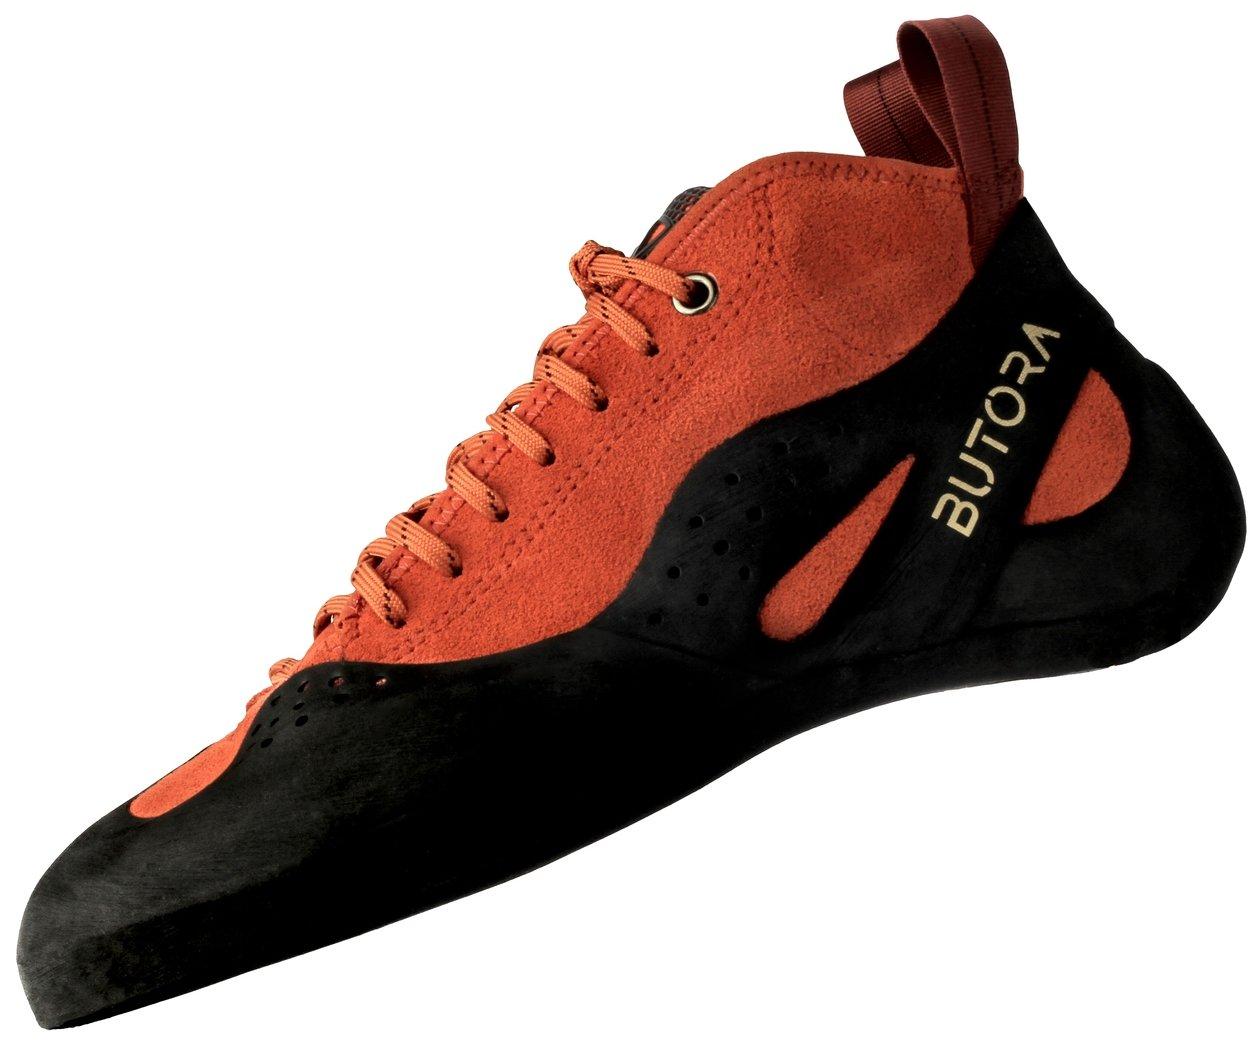 Butora Altura Regular Fit Climbing Shoe - Men's